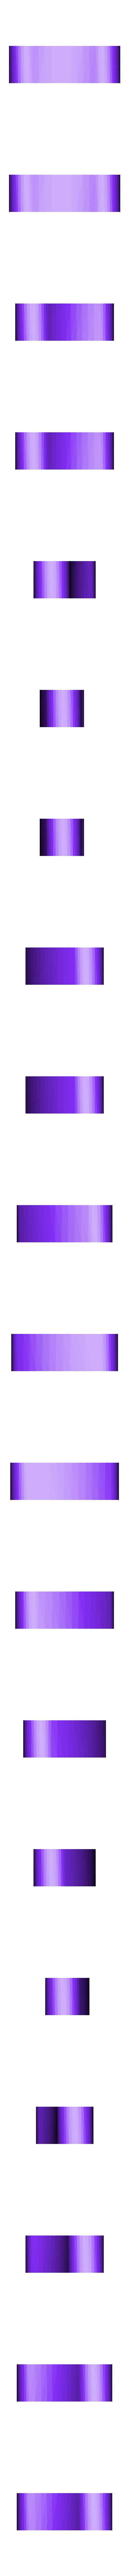 3holesMedium.STL Download free STL file CurvedLinks: Medium size circular links (LEGO Compatible) • 3D print template, byucmr